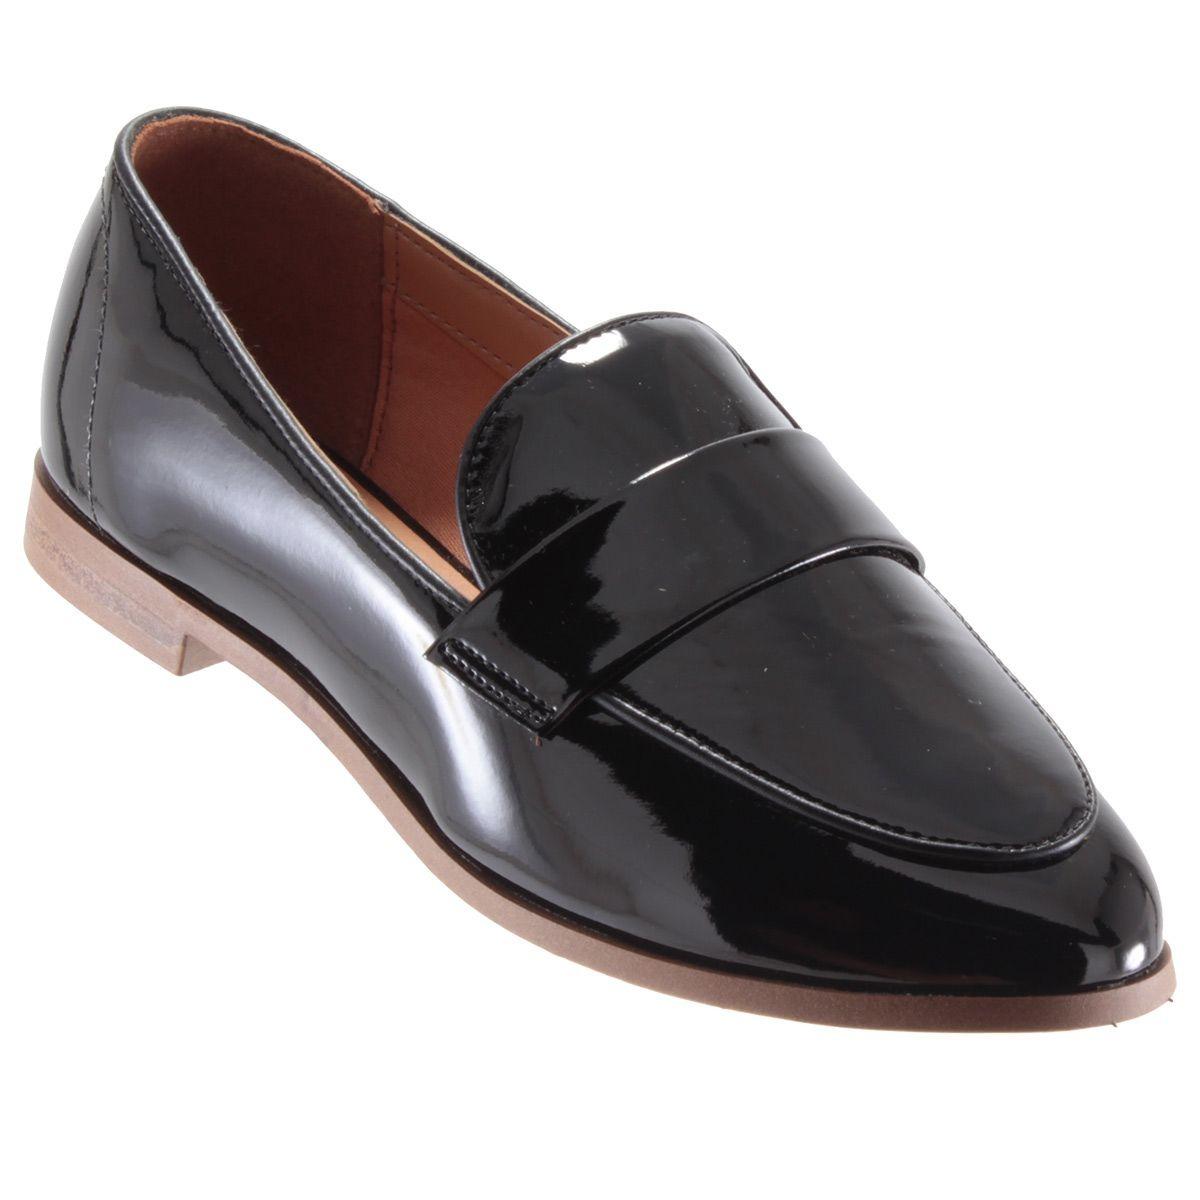 73e23cb0c8 mocassim vizzano sapato feminino verniz 1248102. Carregando zoom.